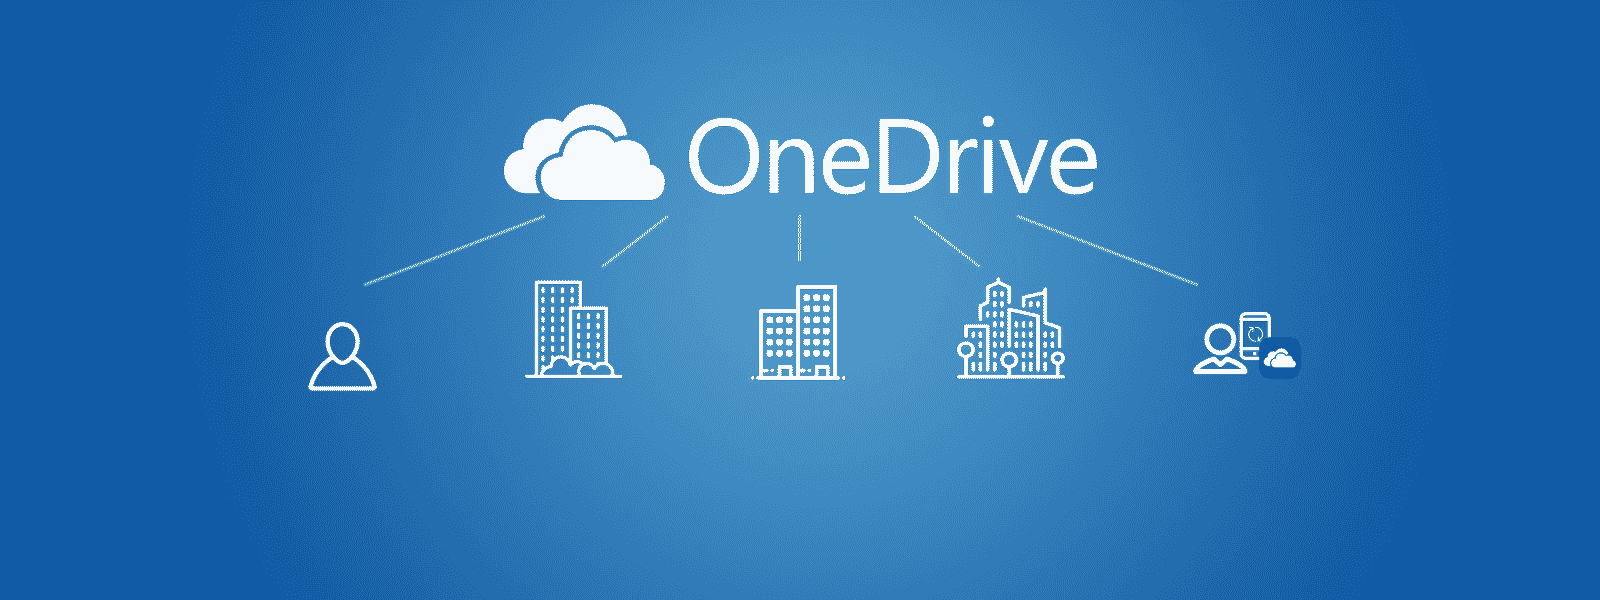 OneDrive-bulut-depolama